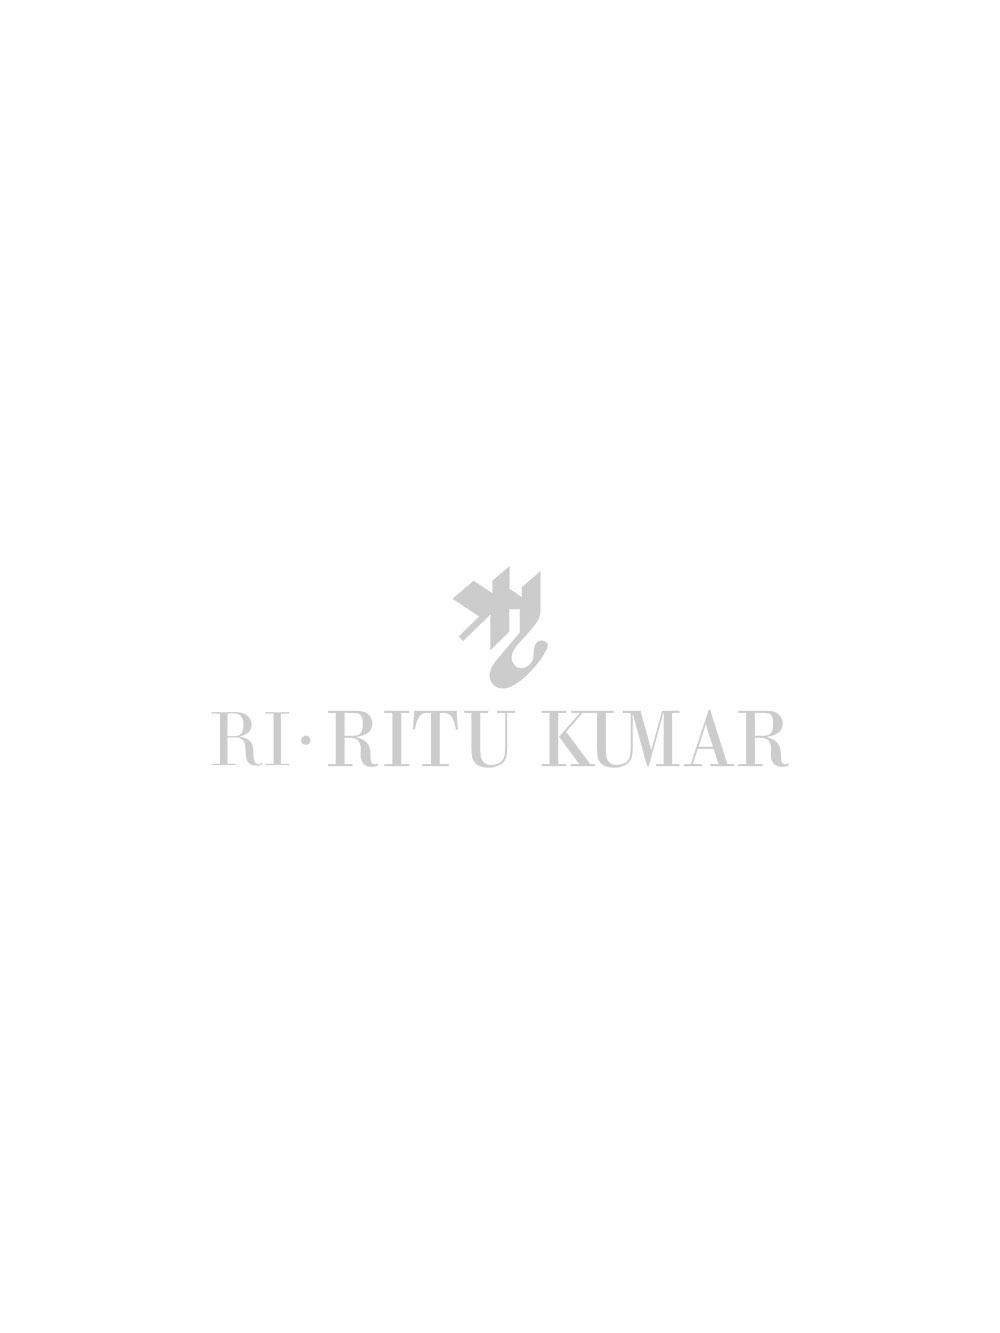 Aquamarine & Turquoise Embroidered Kurta With Dupatta And Churidar